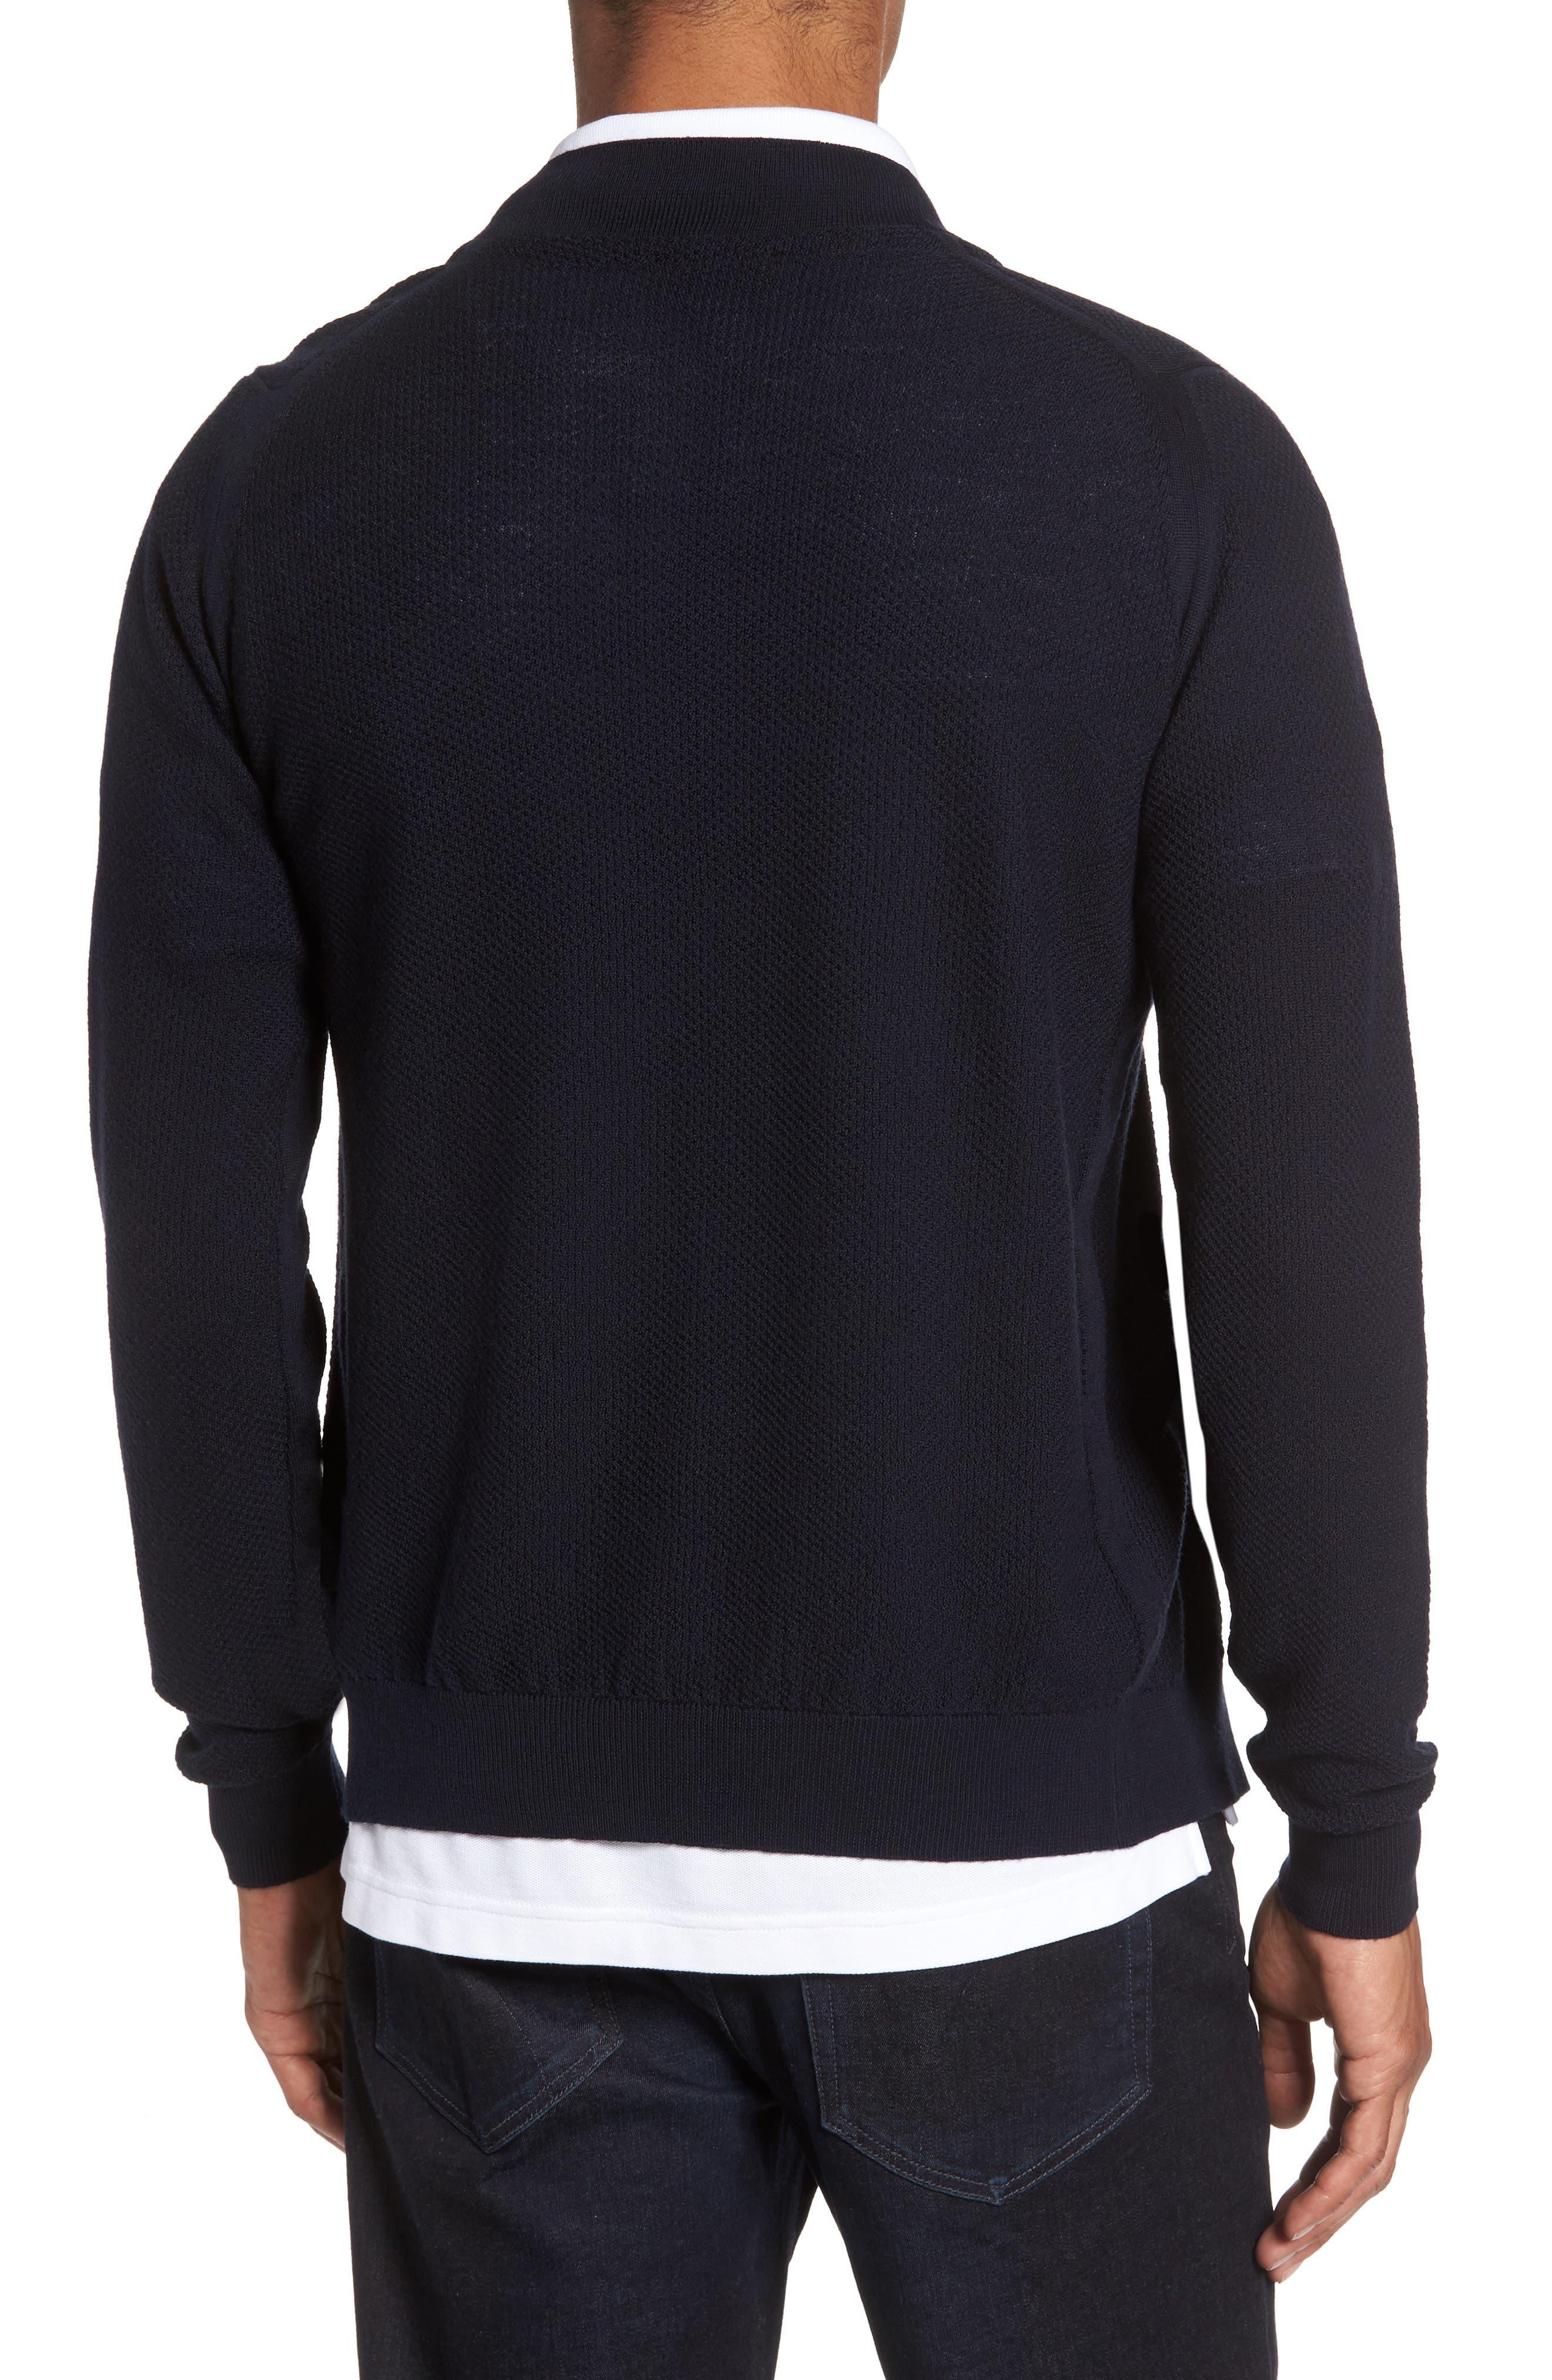 Alternate Image 2  - John Smedley Standard Fit Merino Wool Knit Jacket